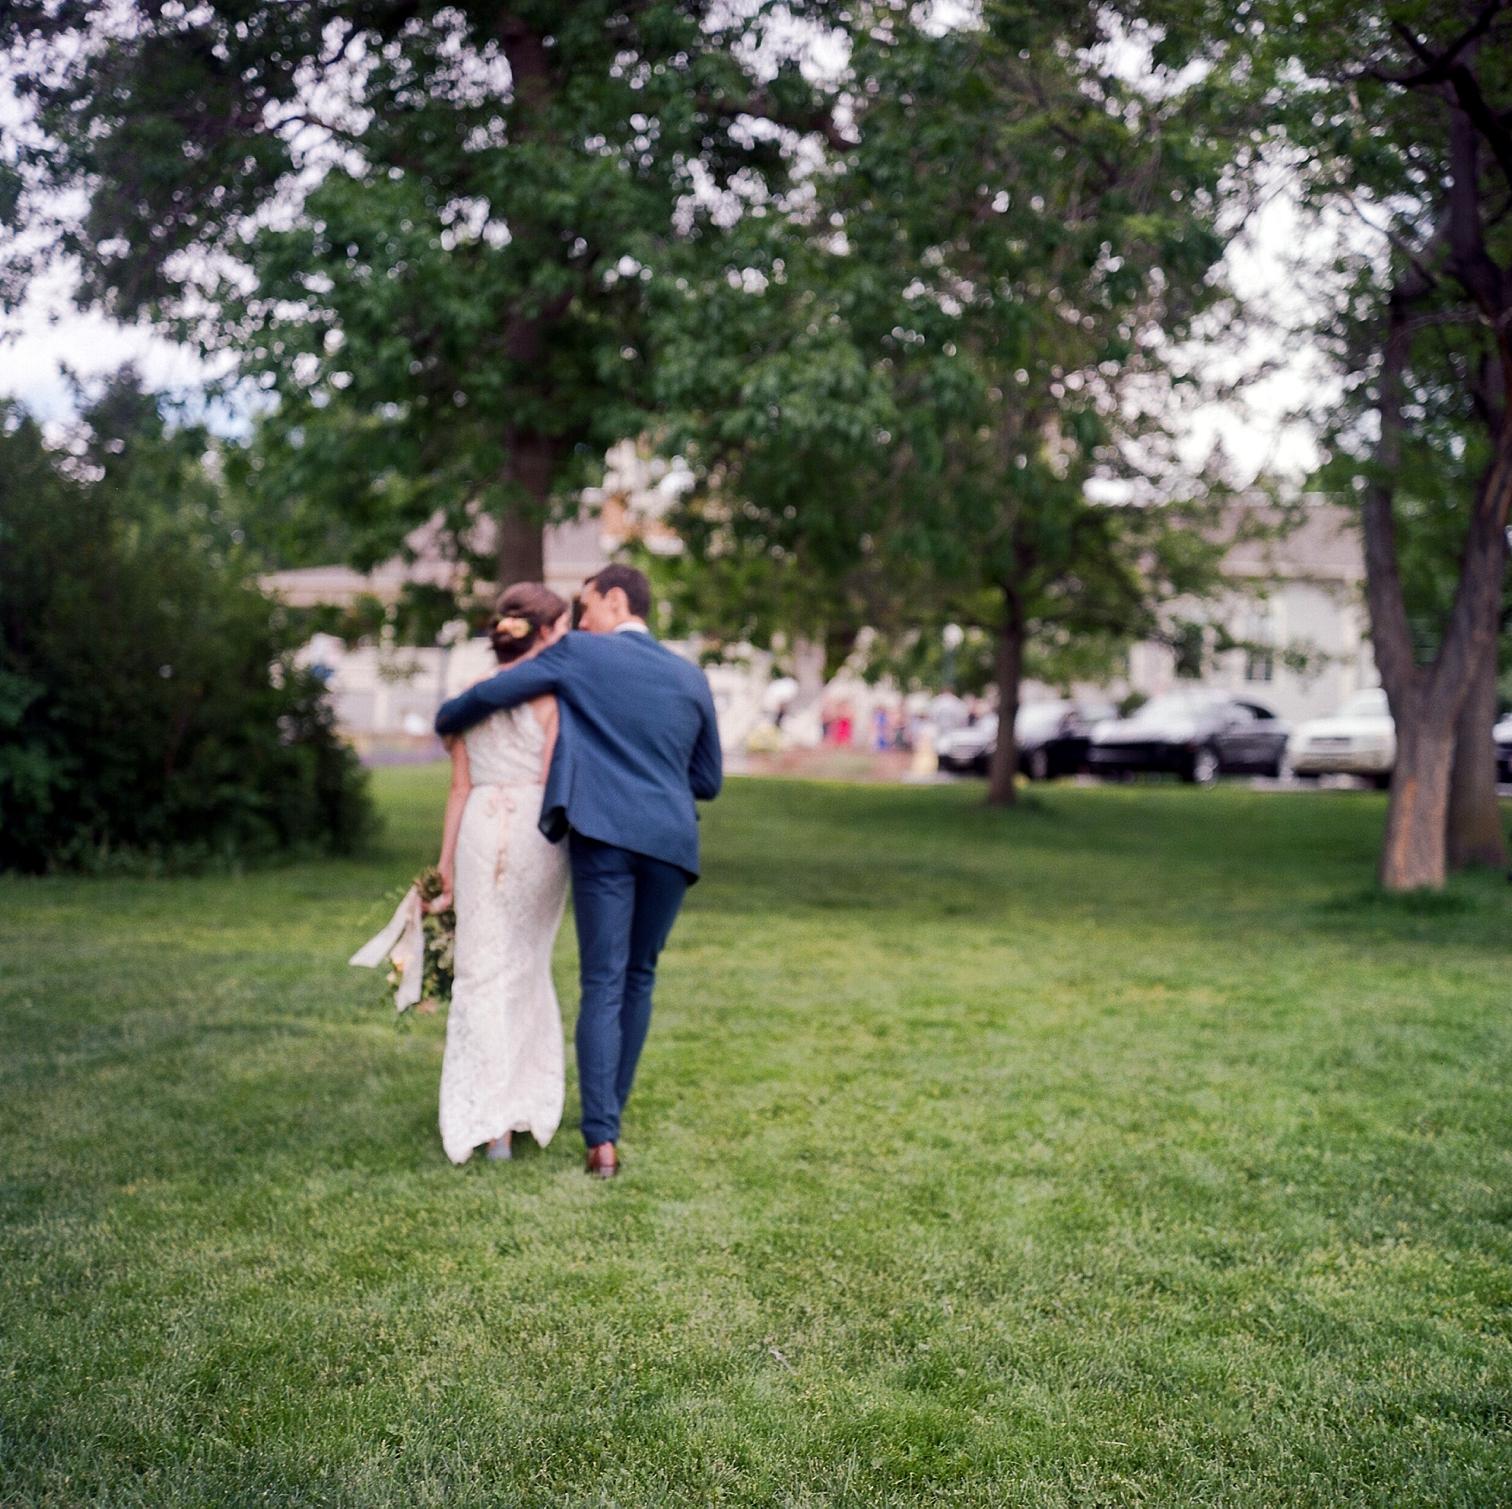 Chautauqua Dining Hall Wedding, Rollieflex Photos, Outdoor Wedding Details, Colorado Mountain Weddings, Danielle DeFiore Photographer, Destination Wedding Photographers, Weddings in Boulder Colorado, Outdoor Ceremony, Film Photographer, Summer Weddings, Bride And Groom, Wedding Reception